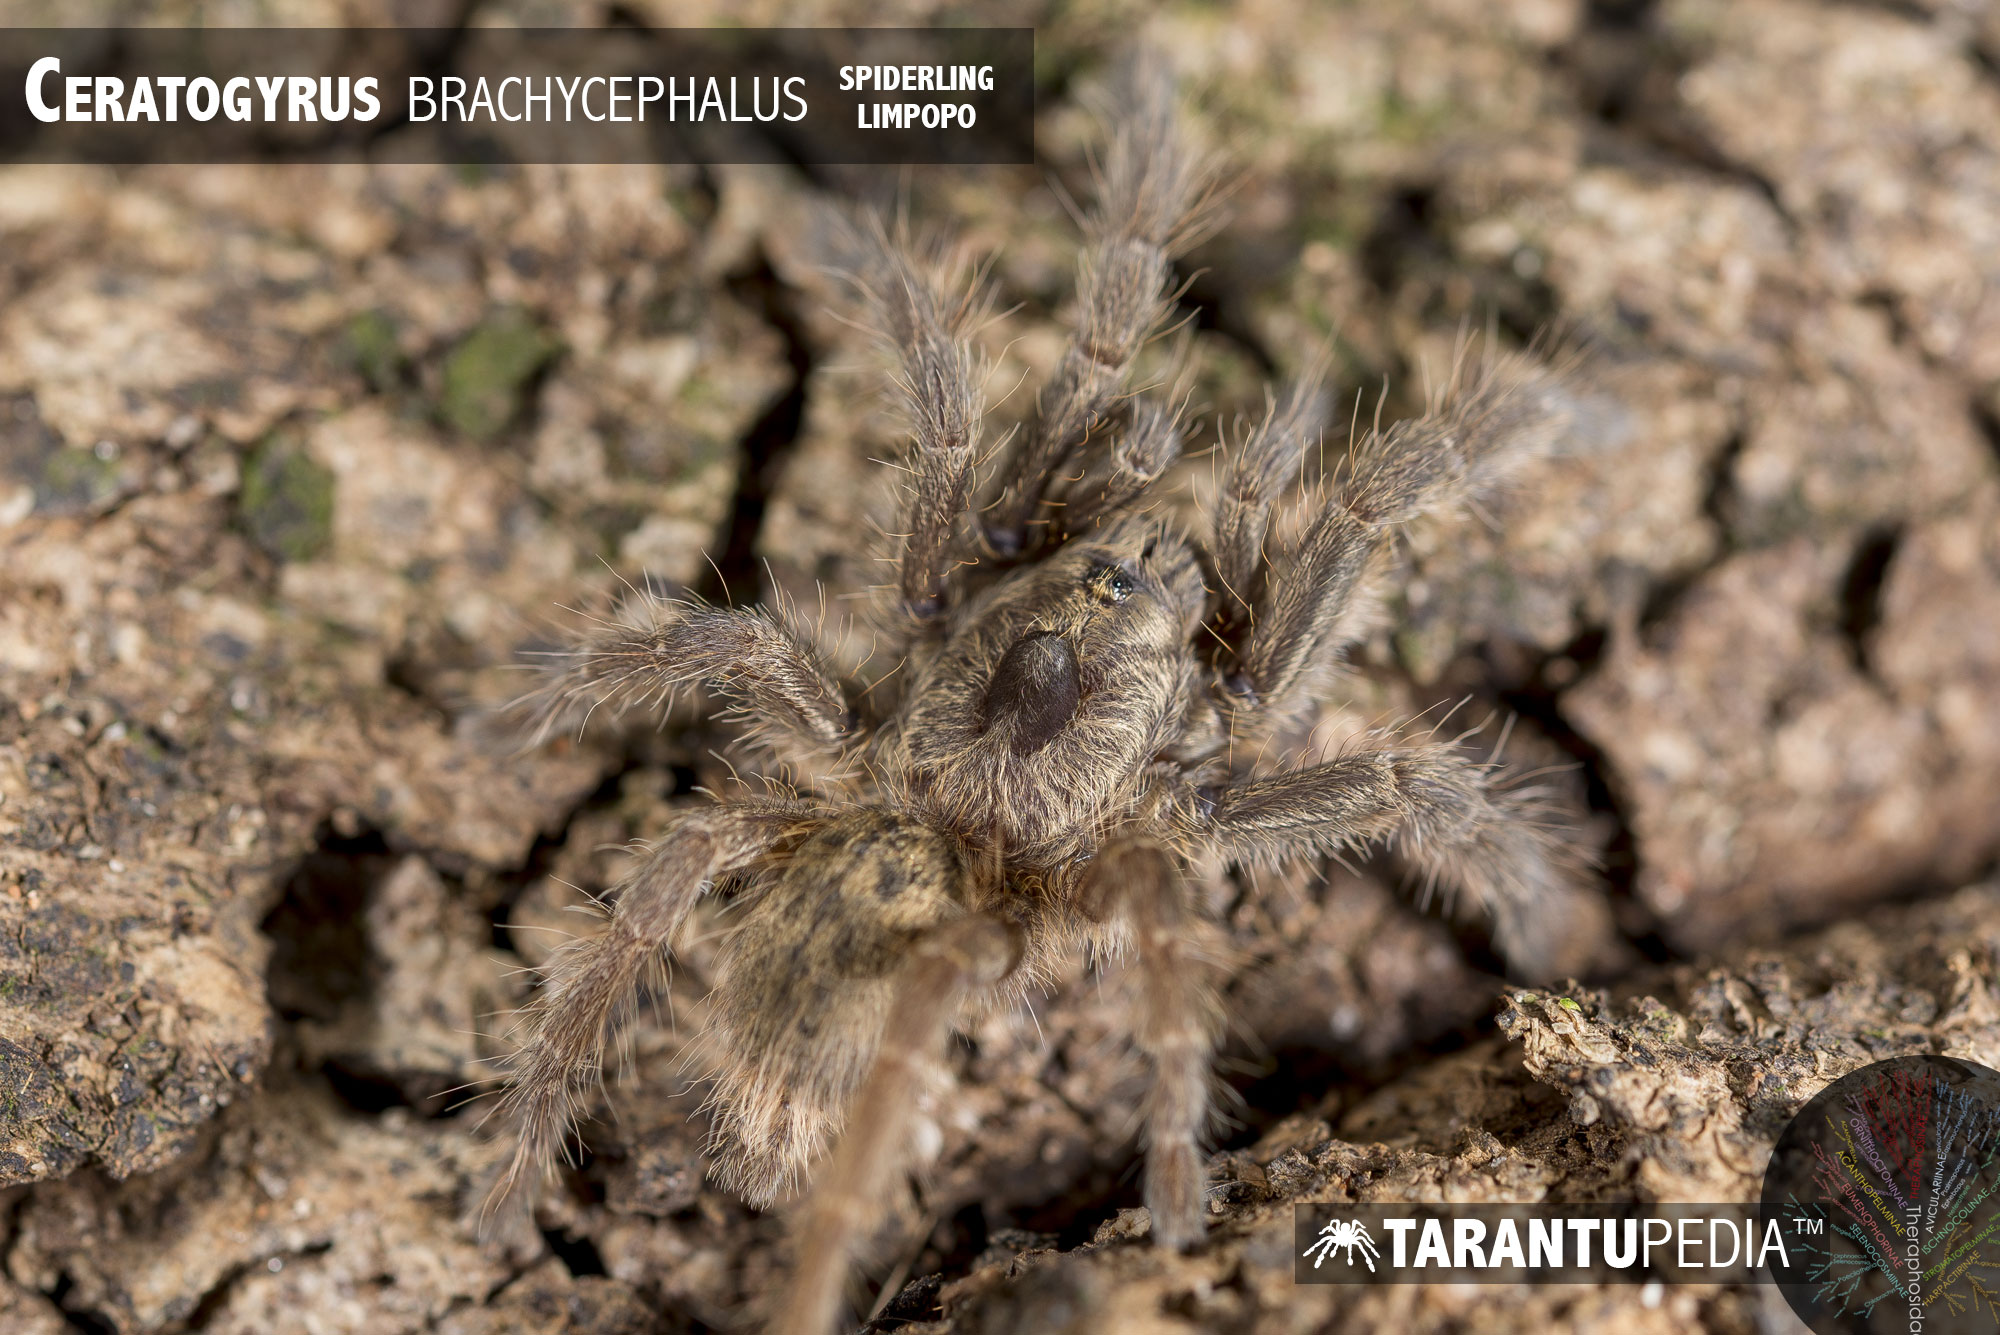 Ceratogyrus brachycephalus